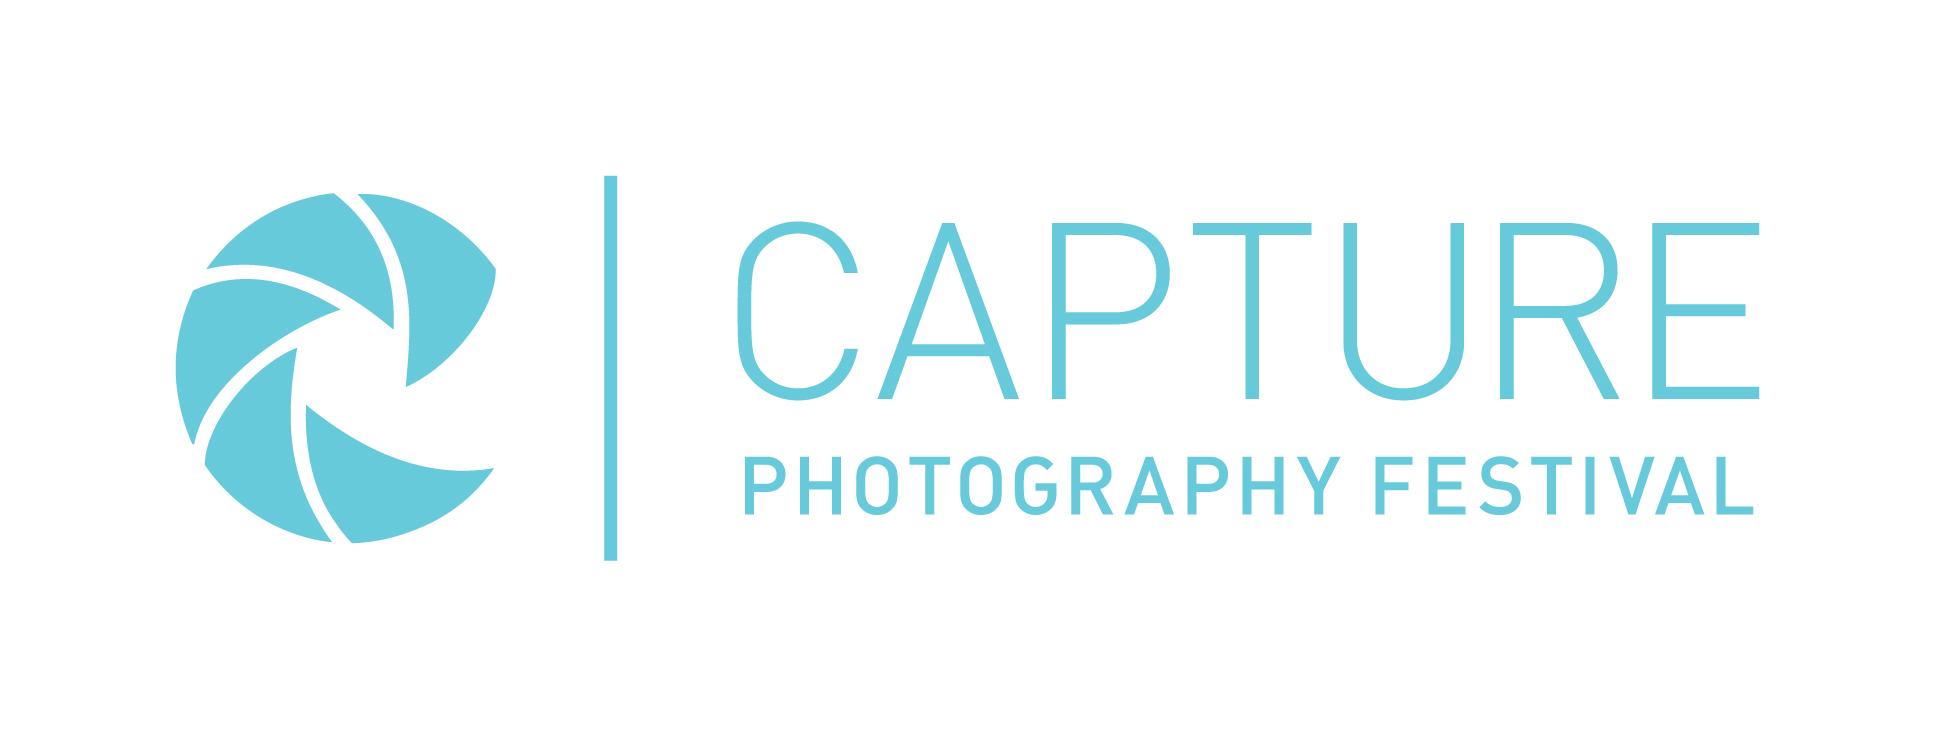 BAG-Capture-Photography-Logo (1).jpg